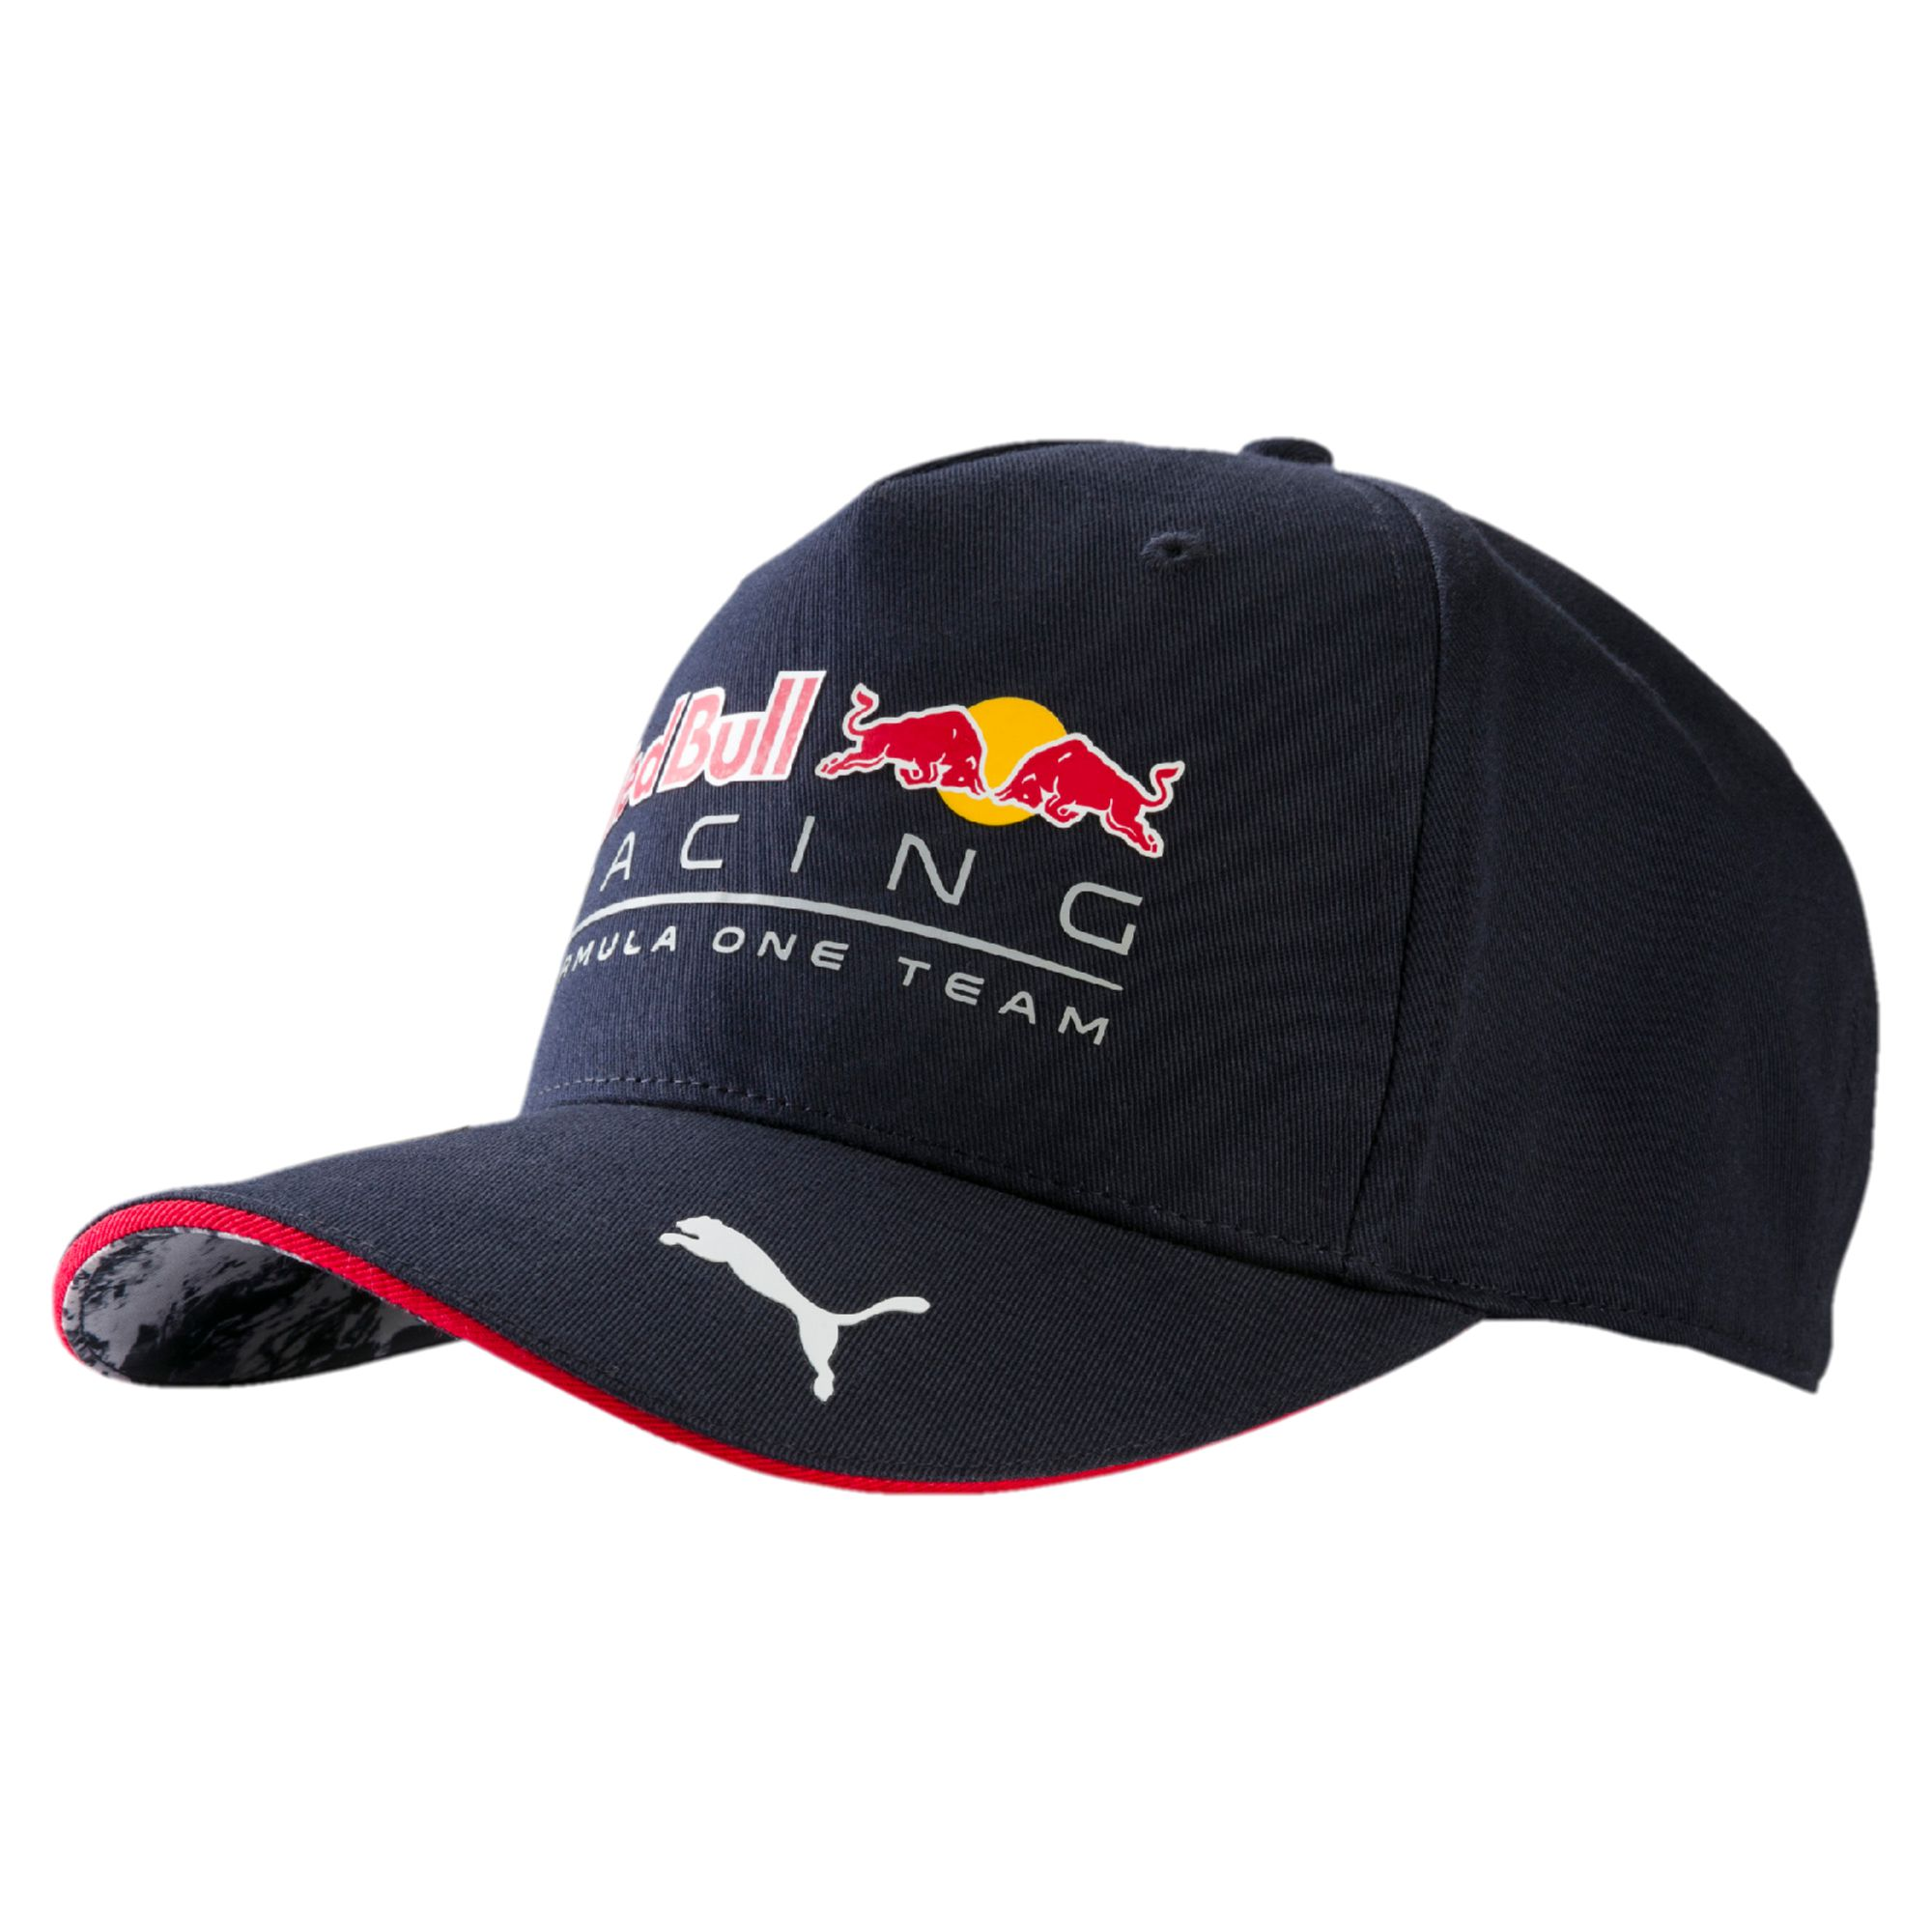 Red Bull Racing Даниэль Риккардо Cap